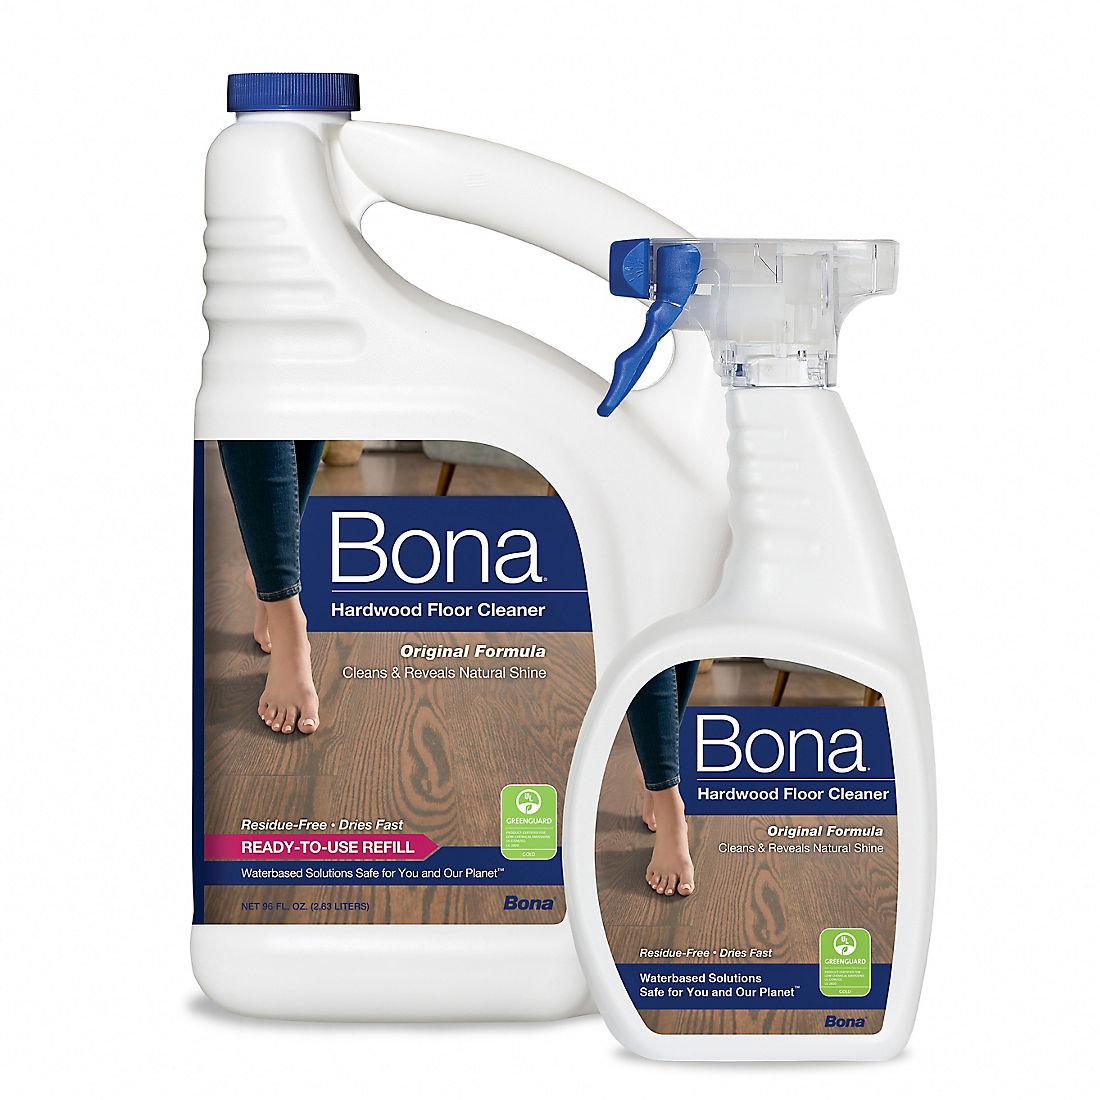 Bona Hardwood Floor Cleaner 22 Oz With 96 Oz Refill Bjs